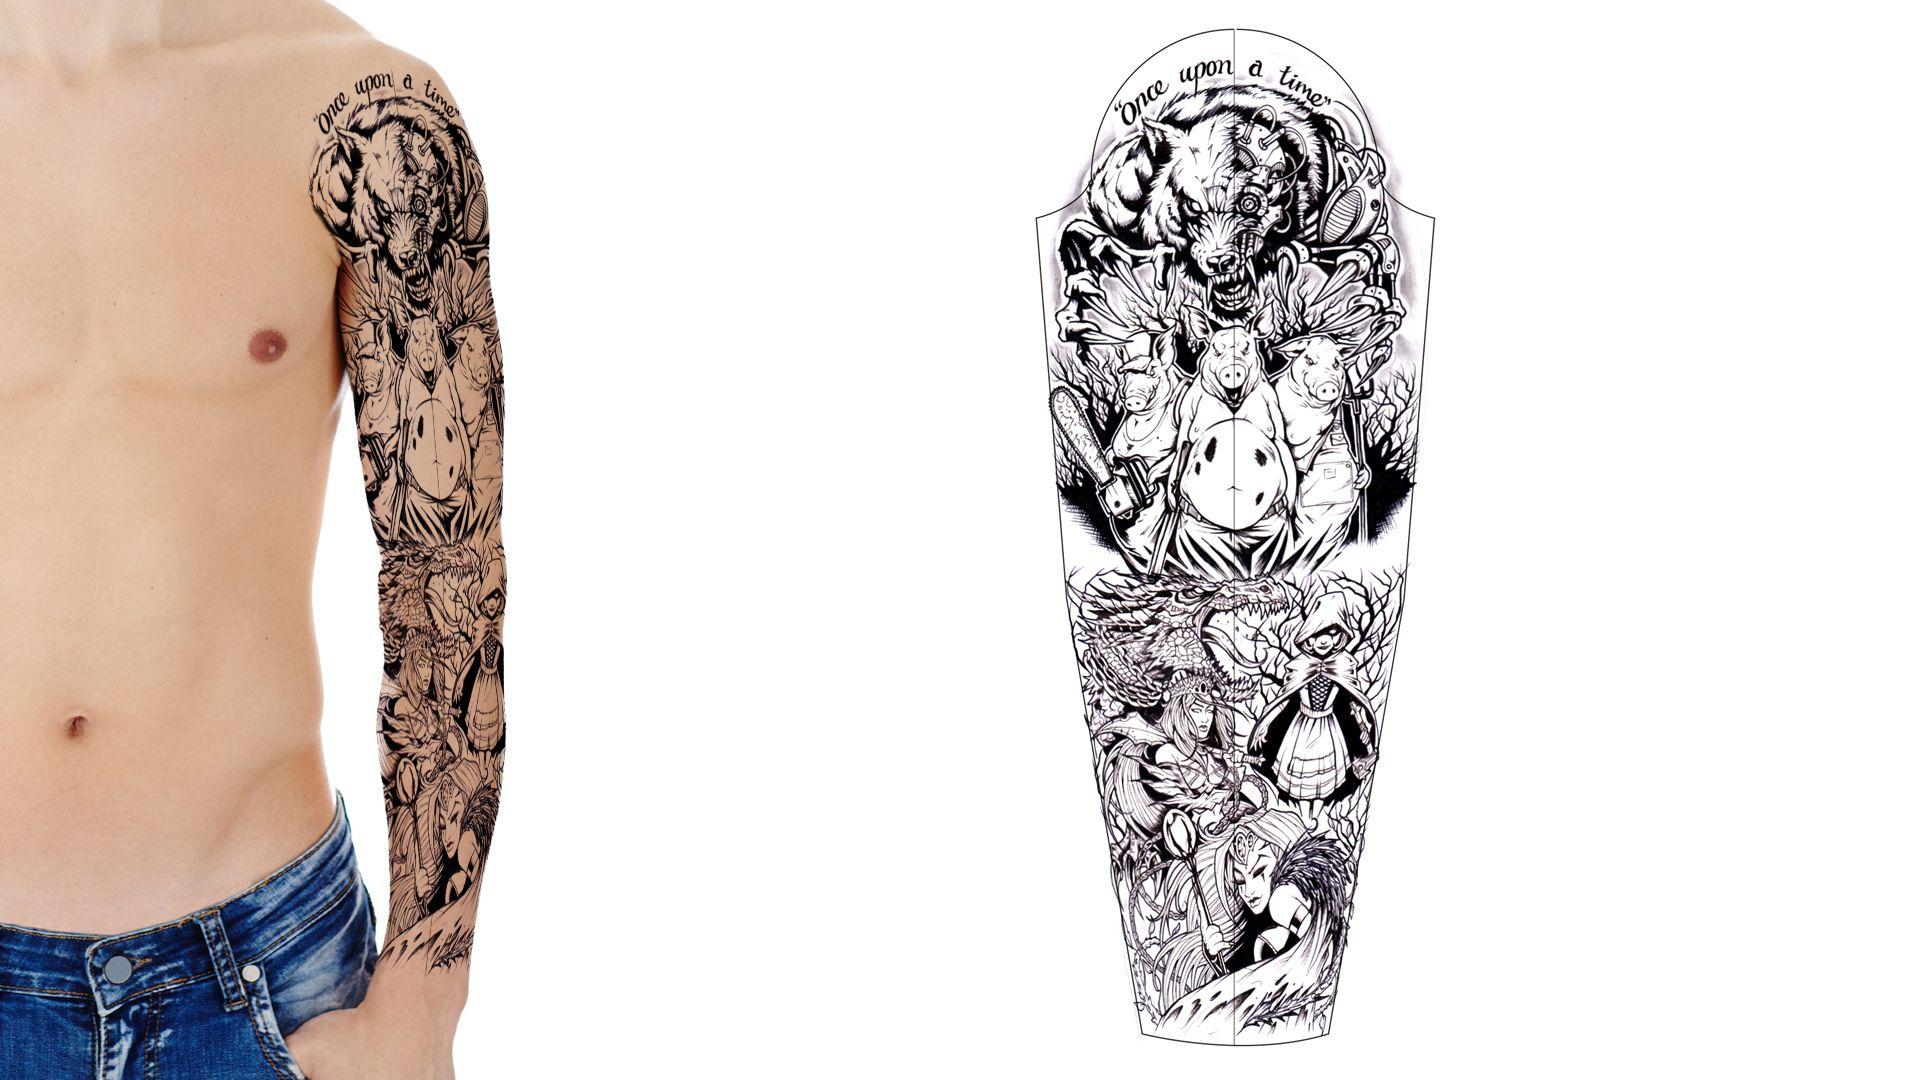 Their Opposing Worlds By Beautifuldragon322 On Deviantart Full Sleeve Tattoo Design Tattoo Sleeve Designs Sleeve Tattoos